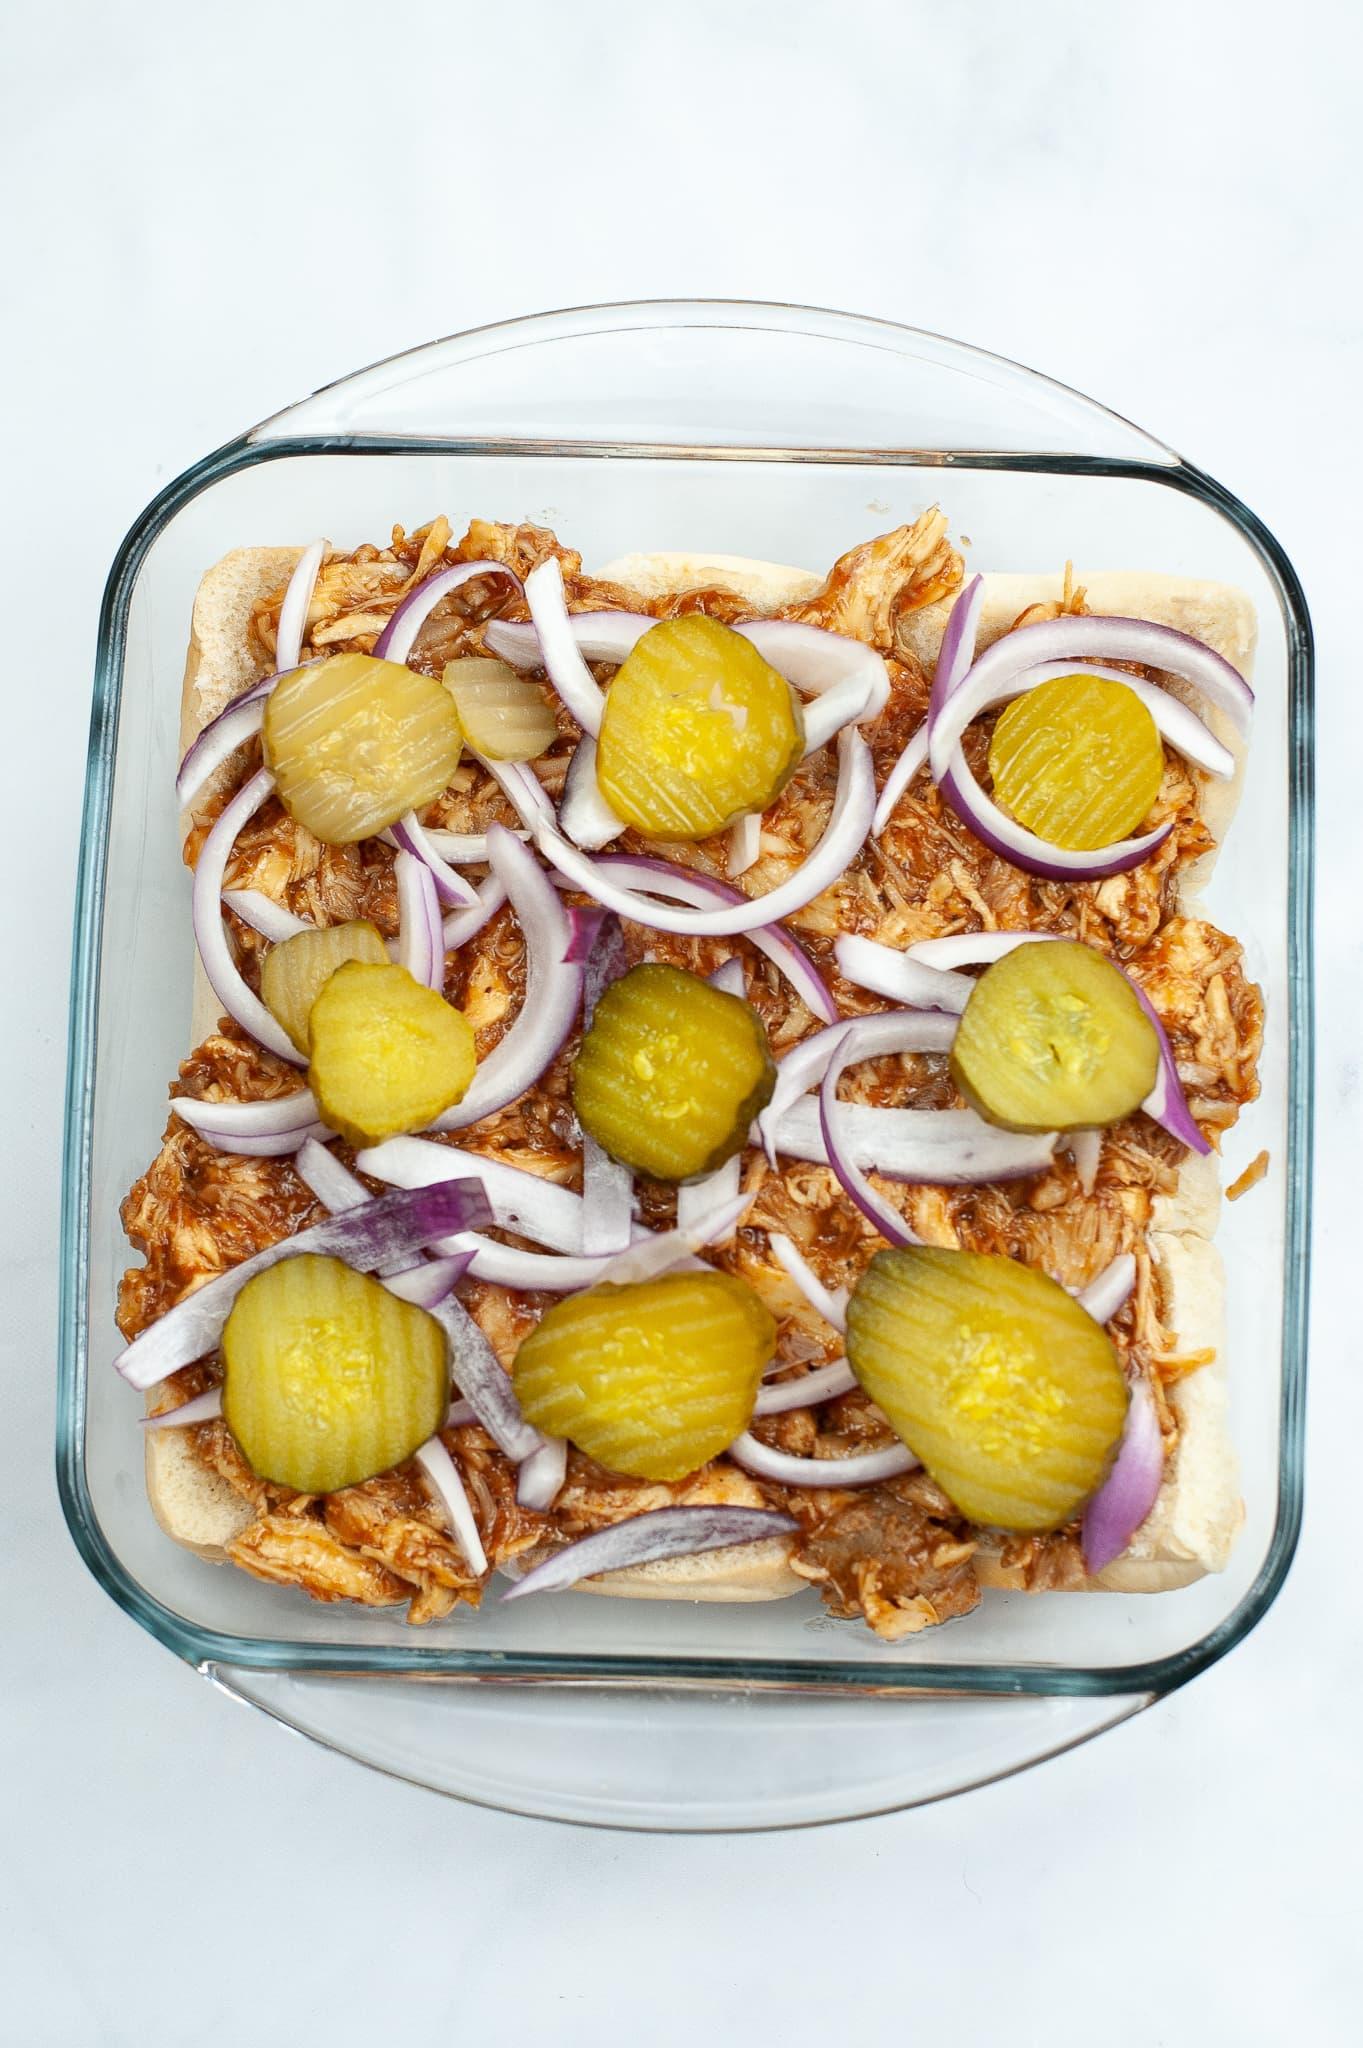 Barbeque Chicken Sliders